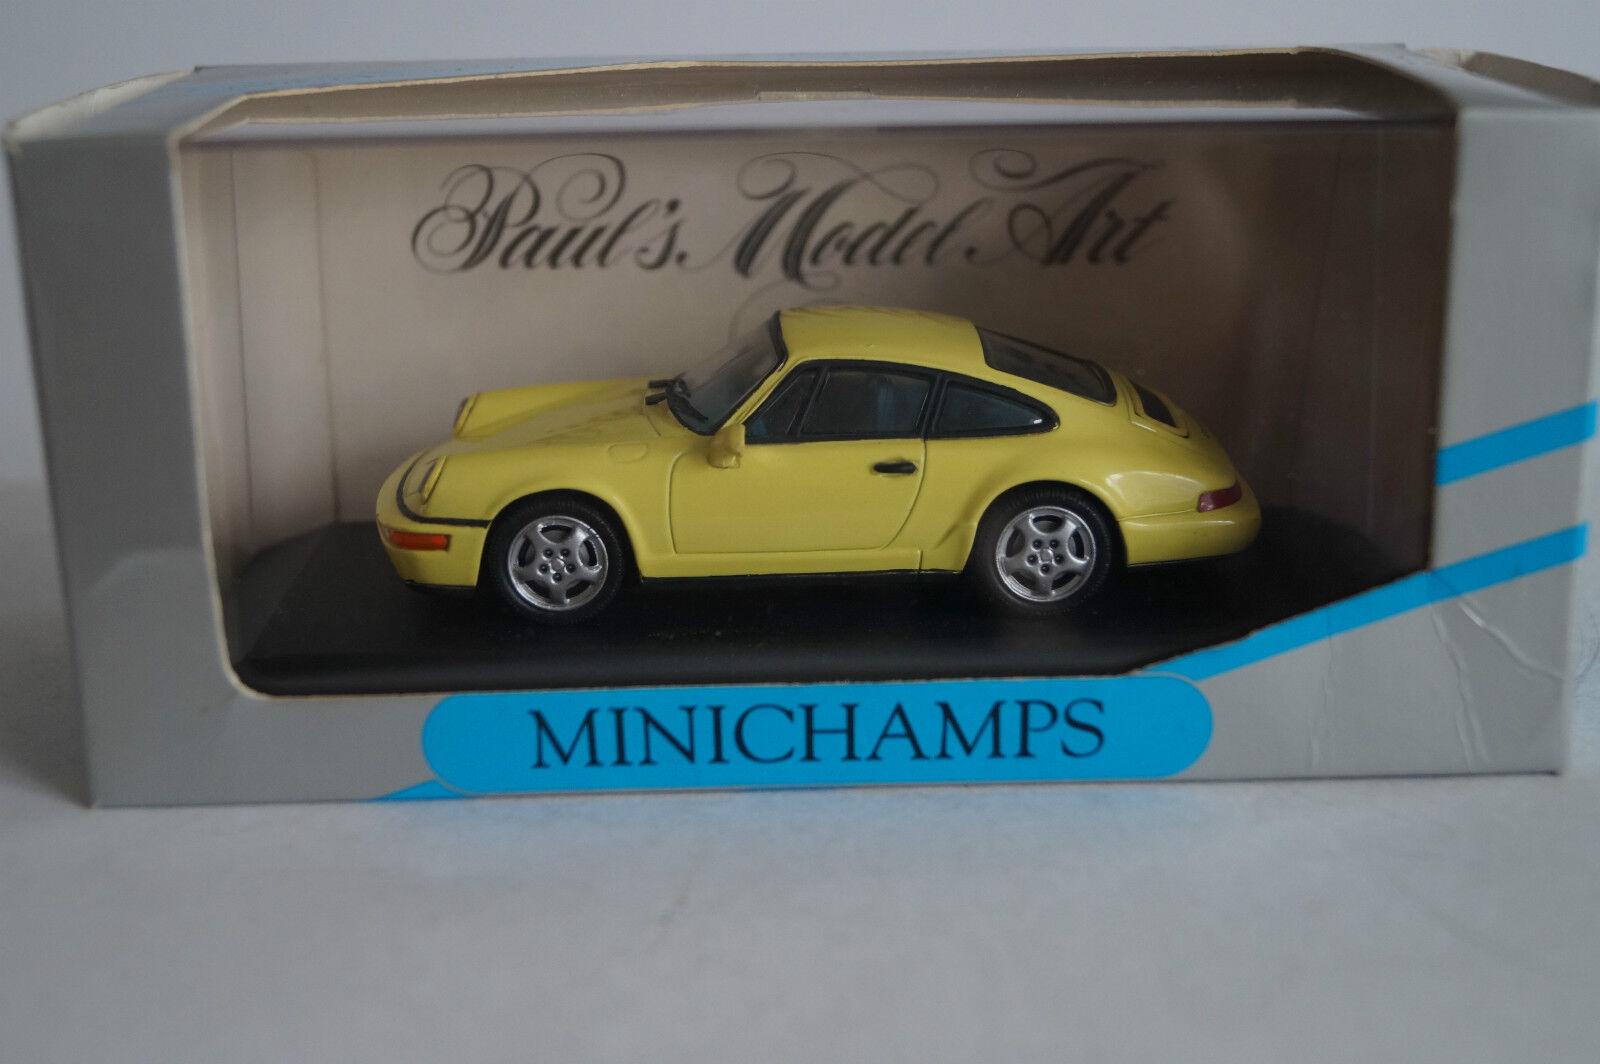 Minichamps Modellauto 1 43 Porsche 911 Carrera 2 4 1992 Nr. 062120    Bevorzugtes Material